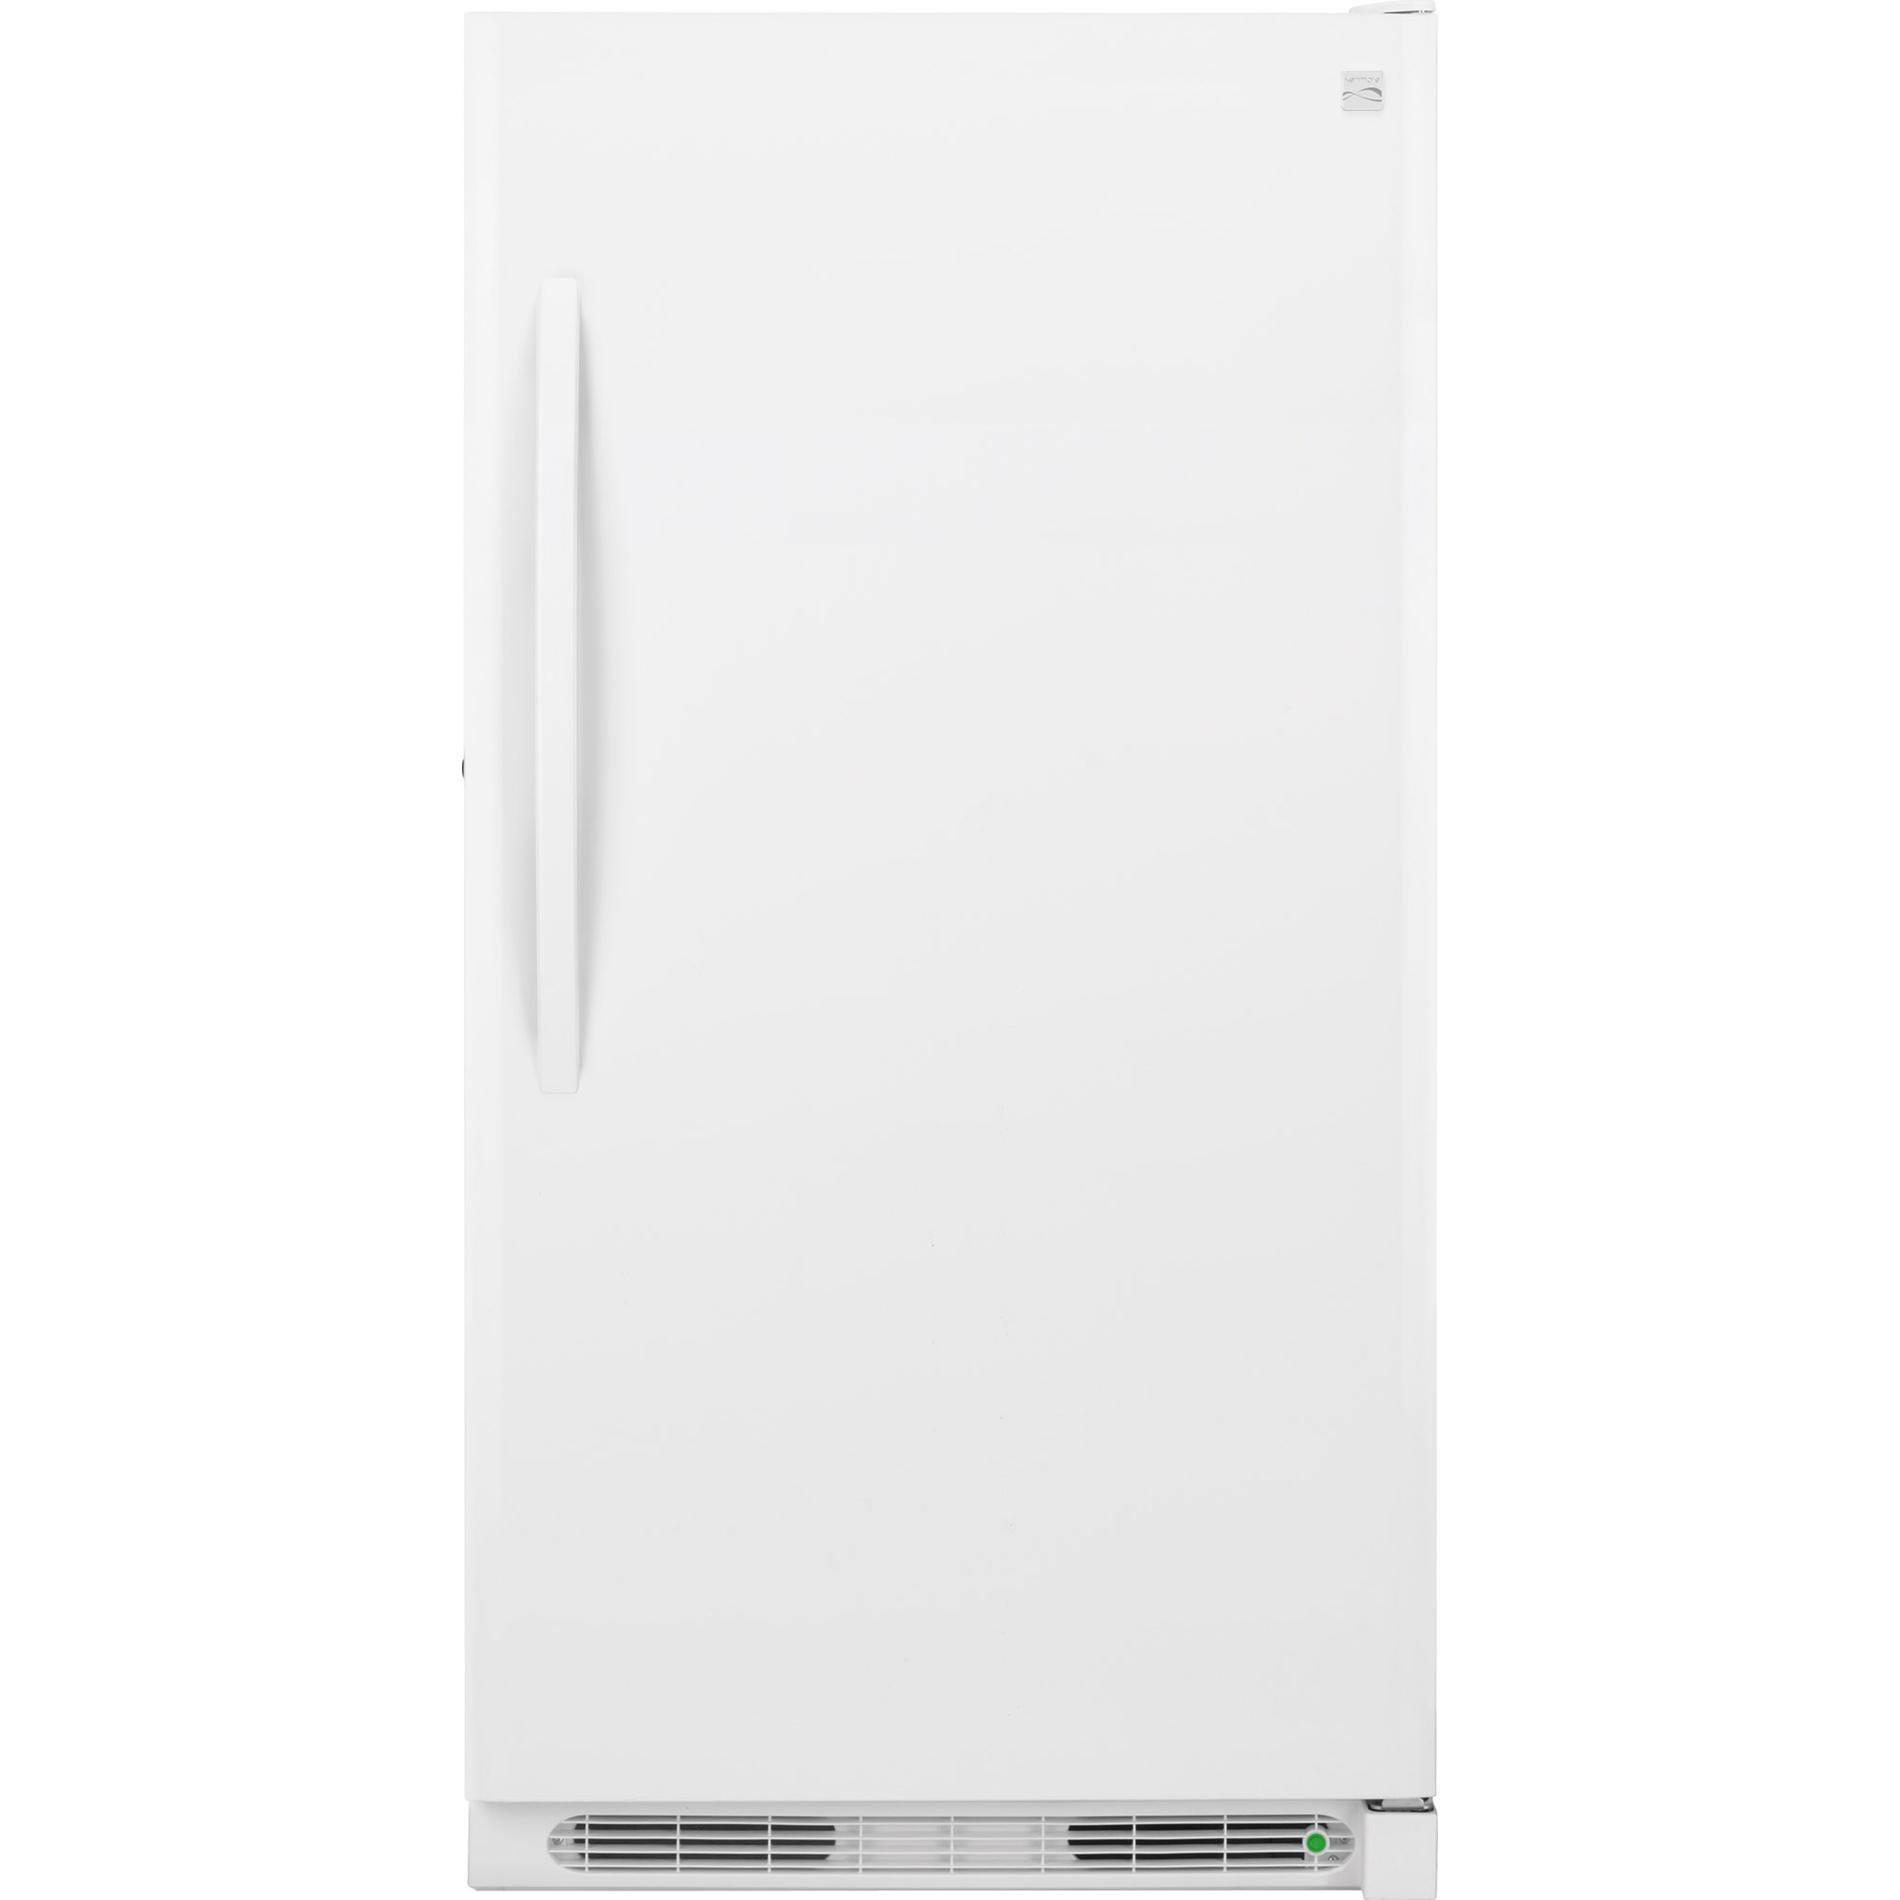 medium resolution of kenmore 22042 20 2 cu ft frost free upright freezer white freezer wiring schematic wire schematic for kenmore upright freezer